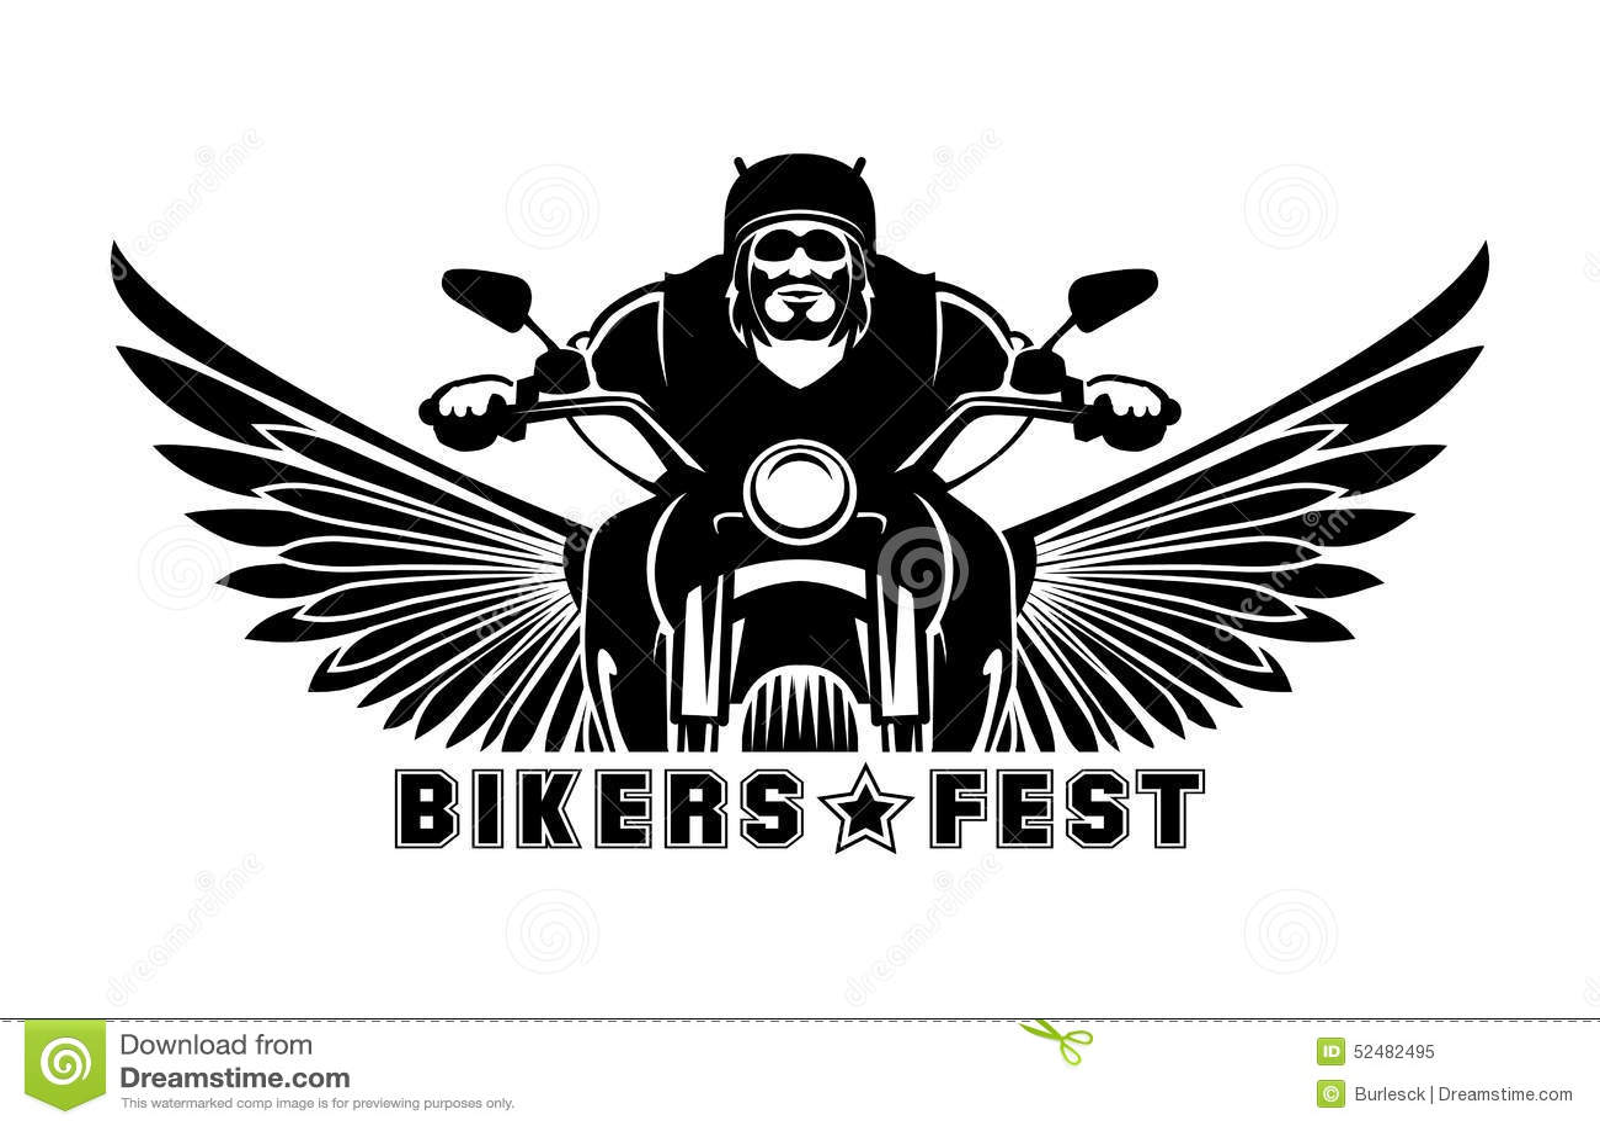 Biker Logo Stock Illustrations 9 757 Biker Logo Stock Illustrations Vectors Clipart Dreamstime